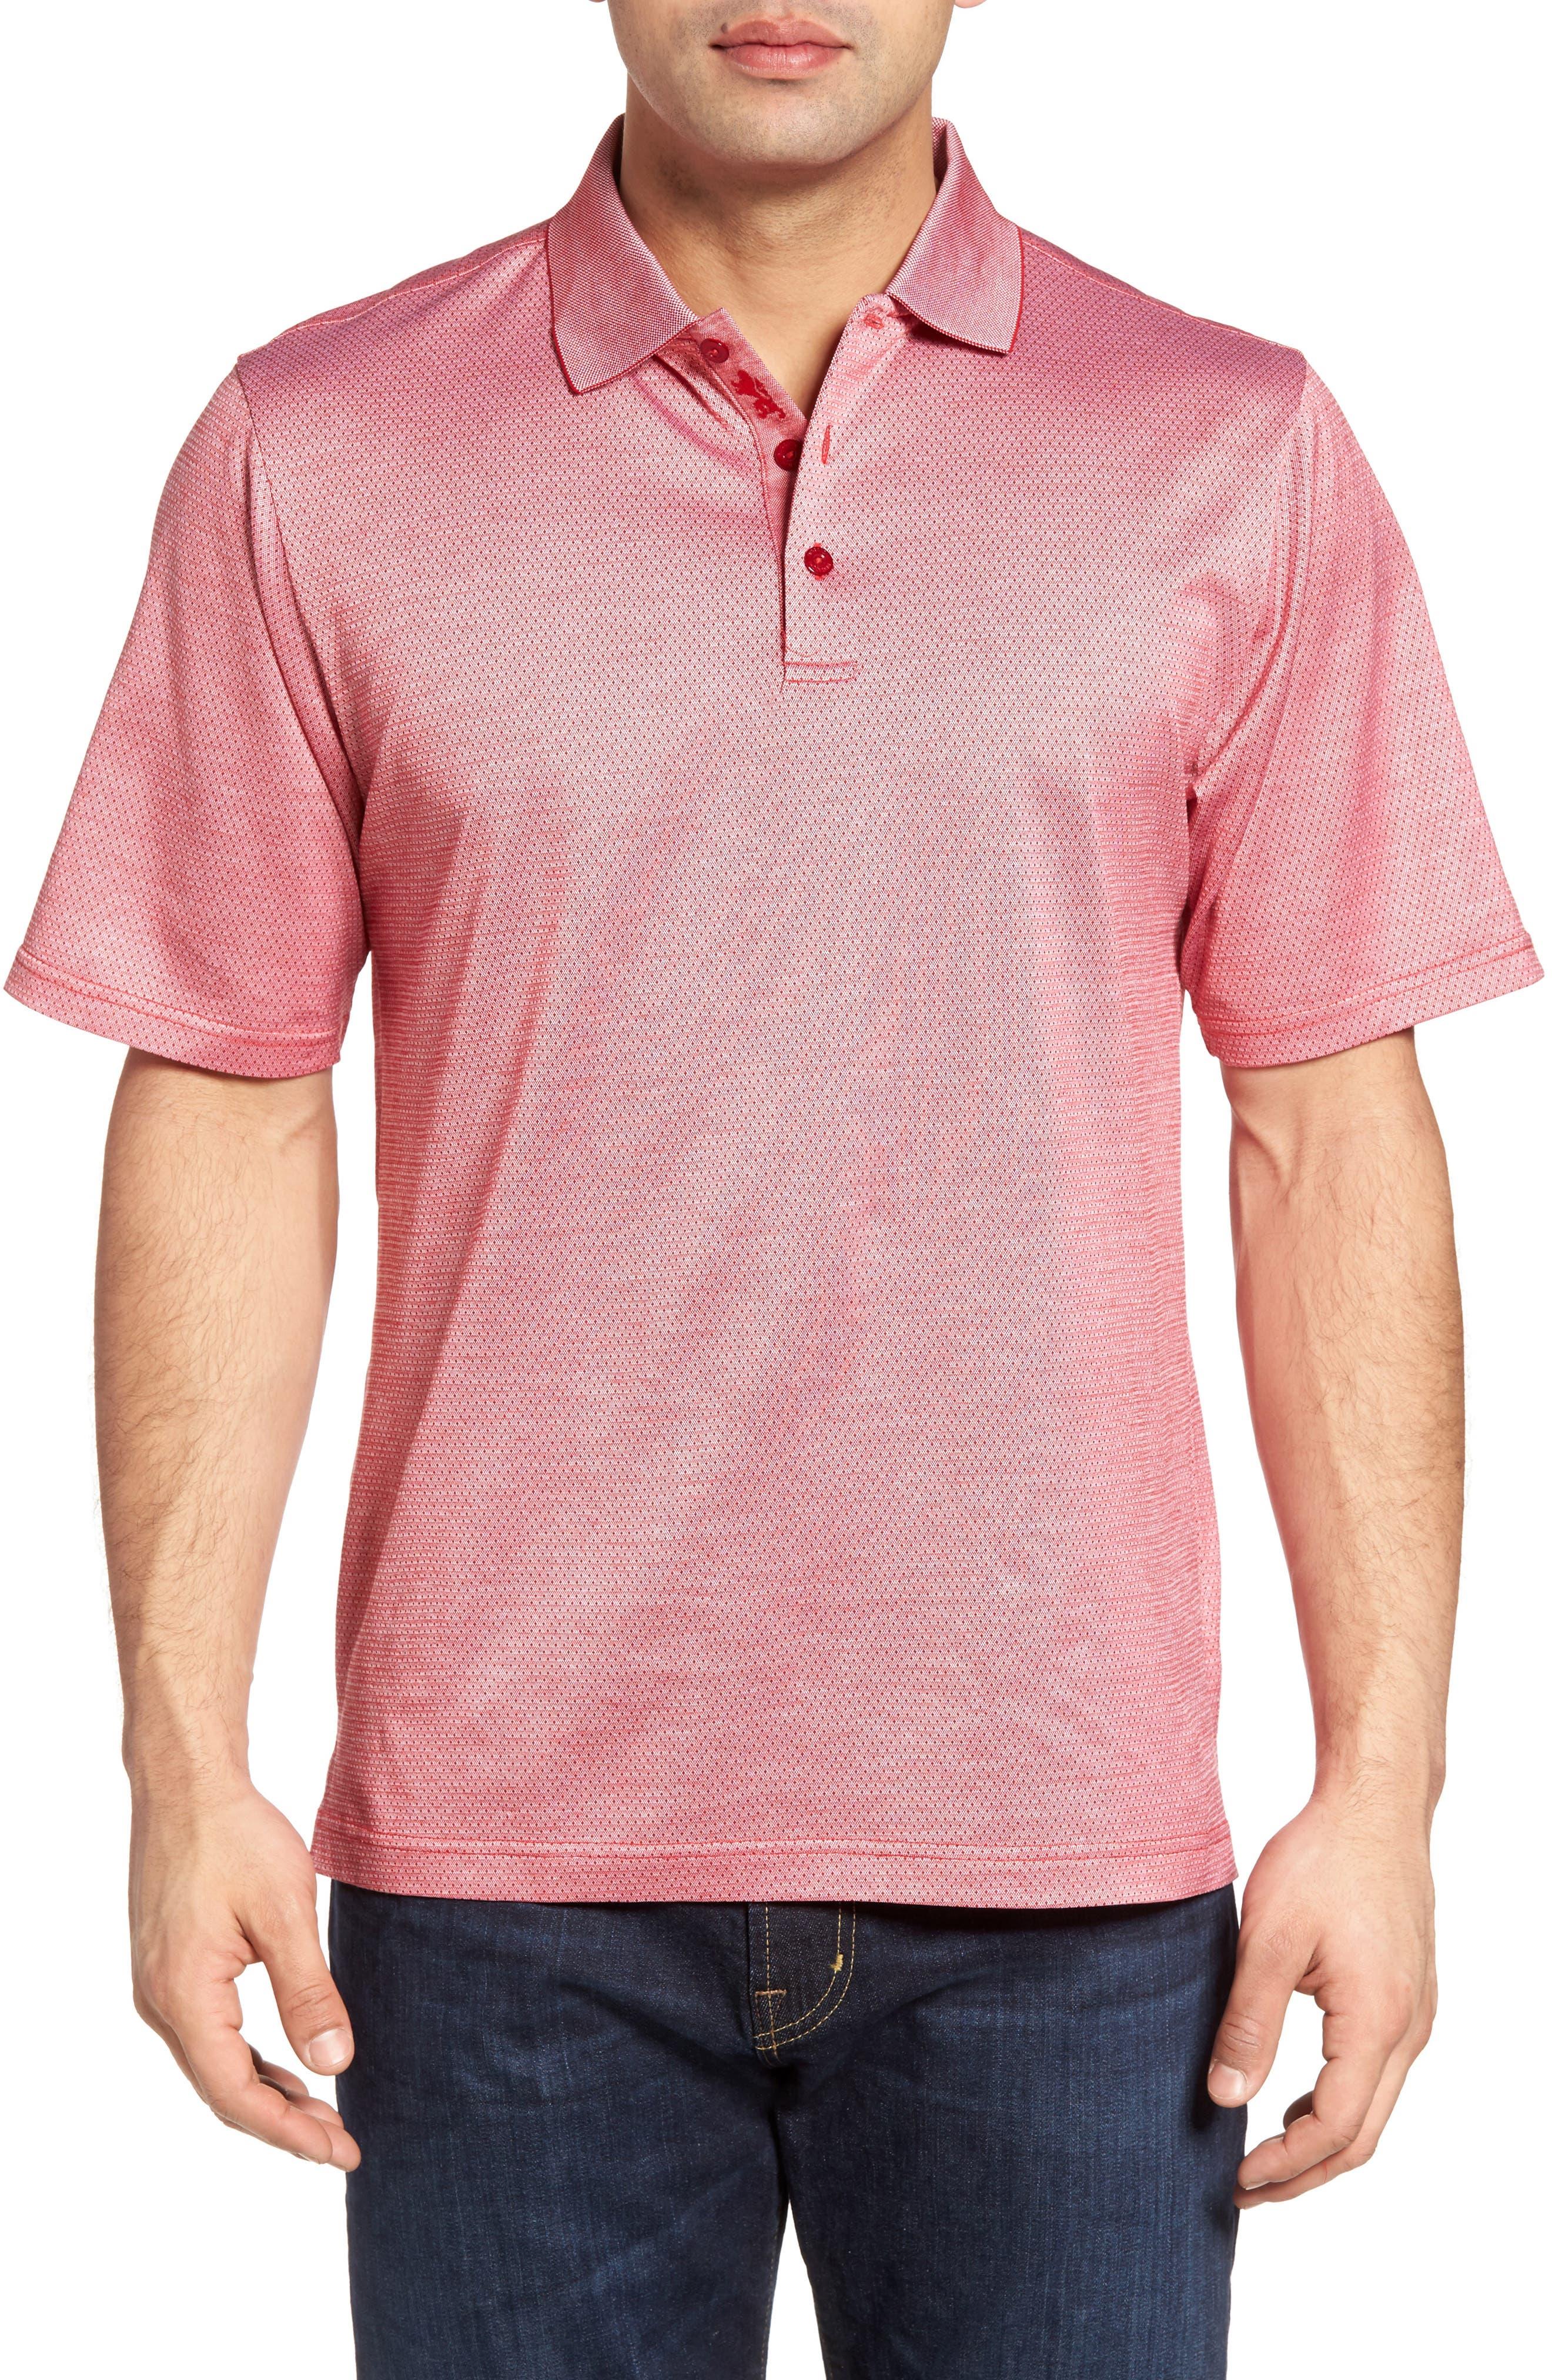 BUGATCHI Mercerized Cotton Polo